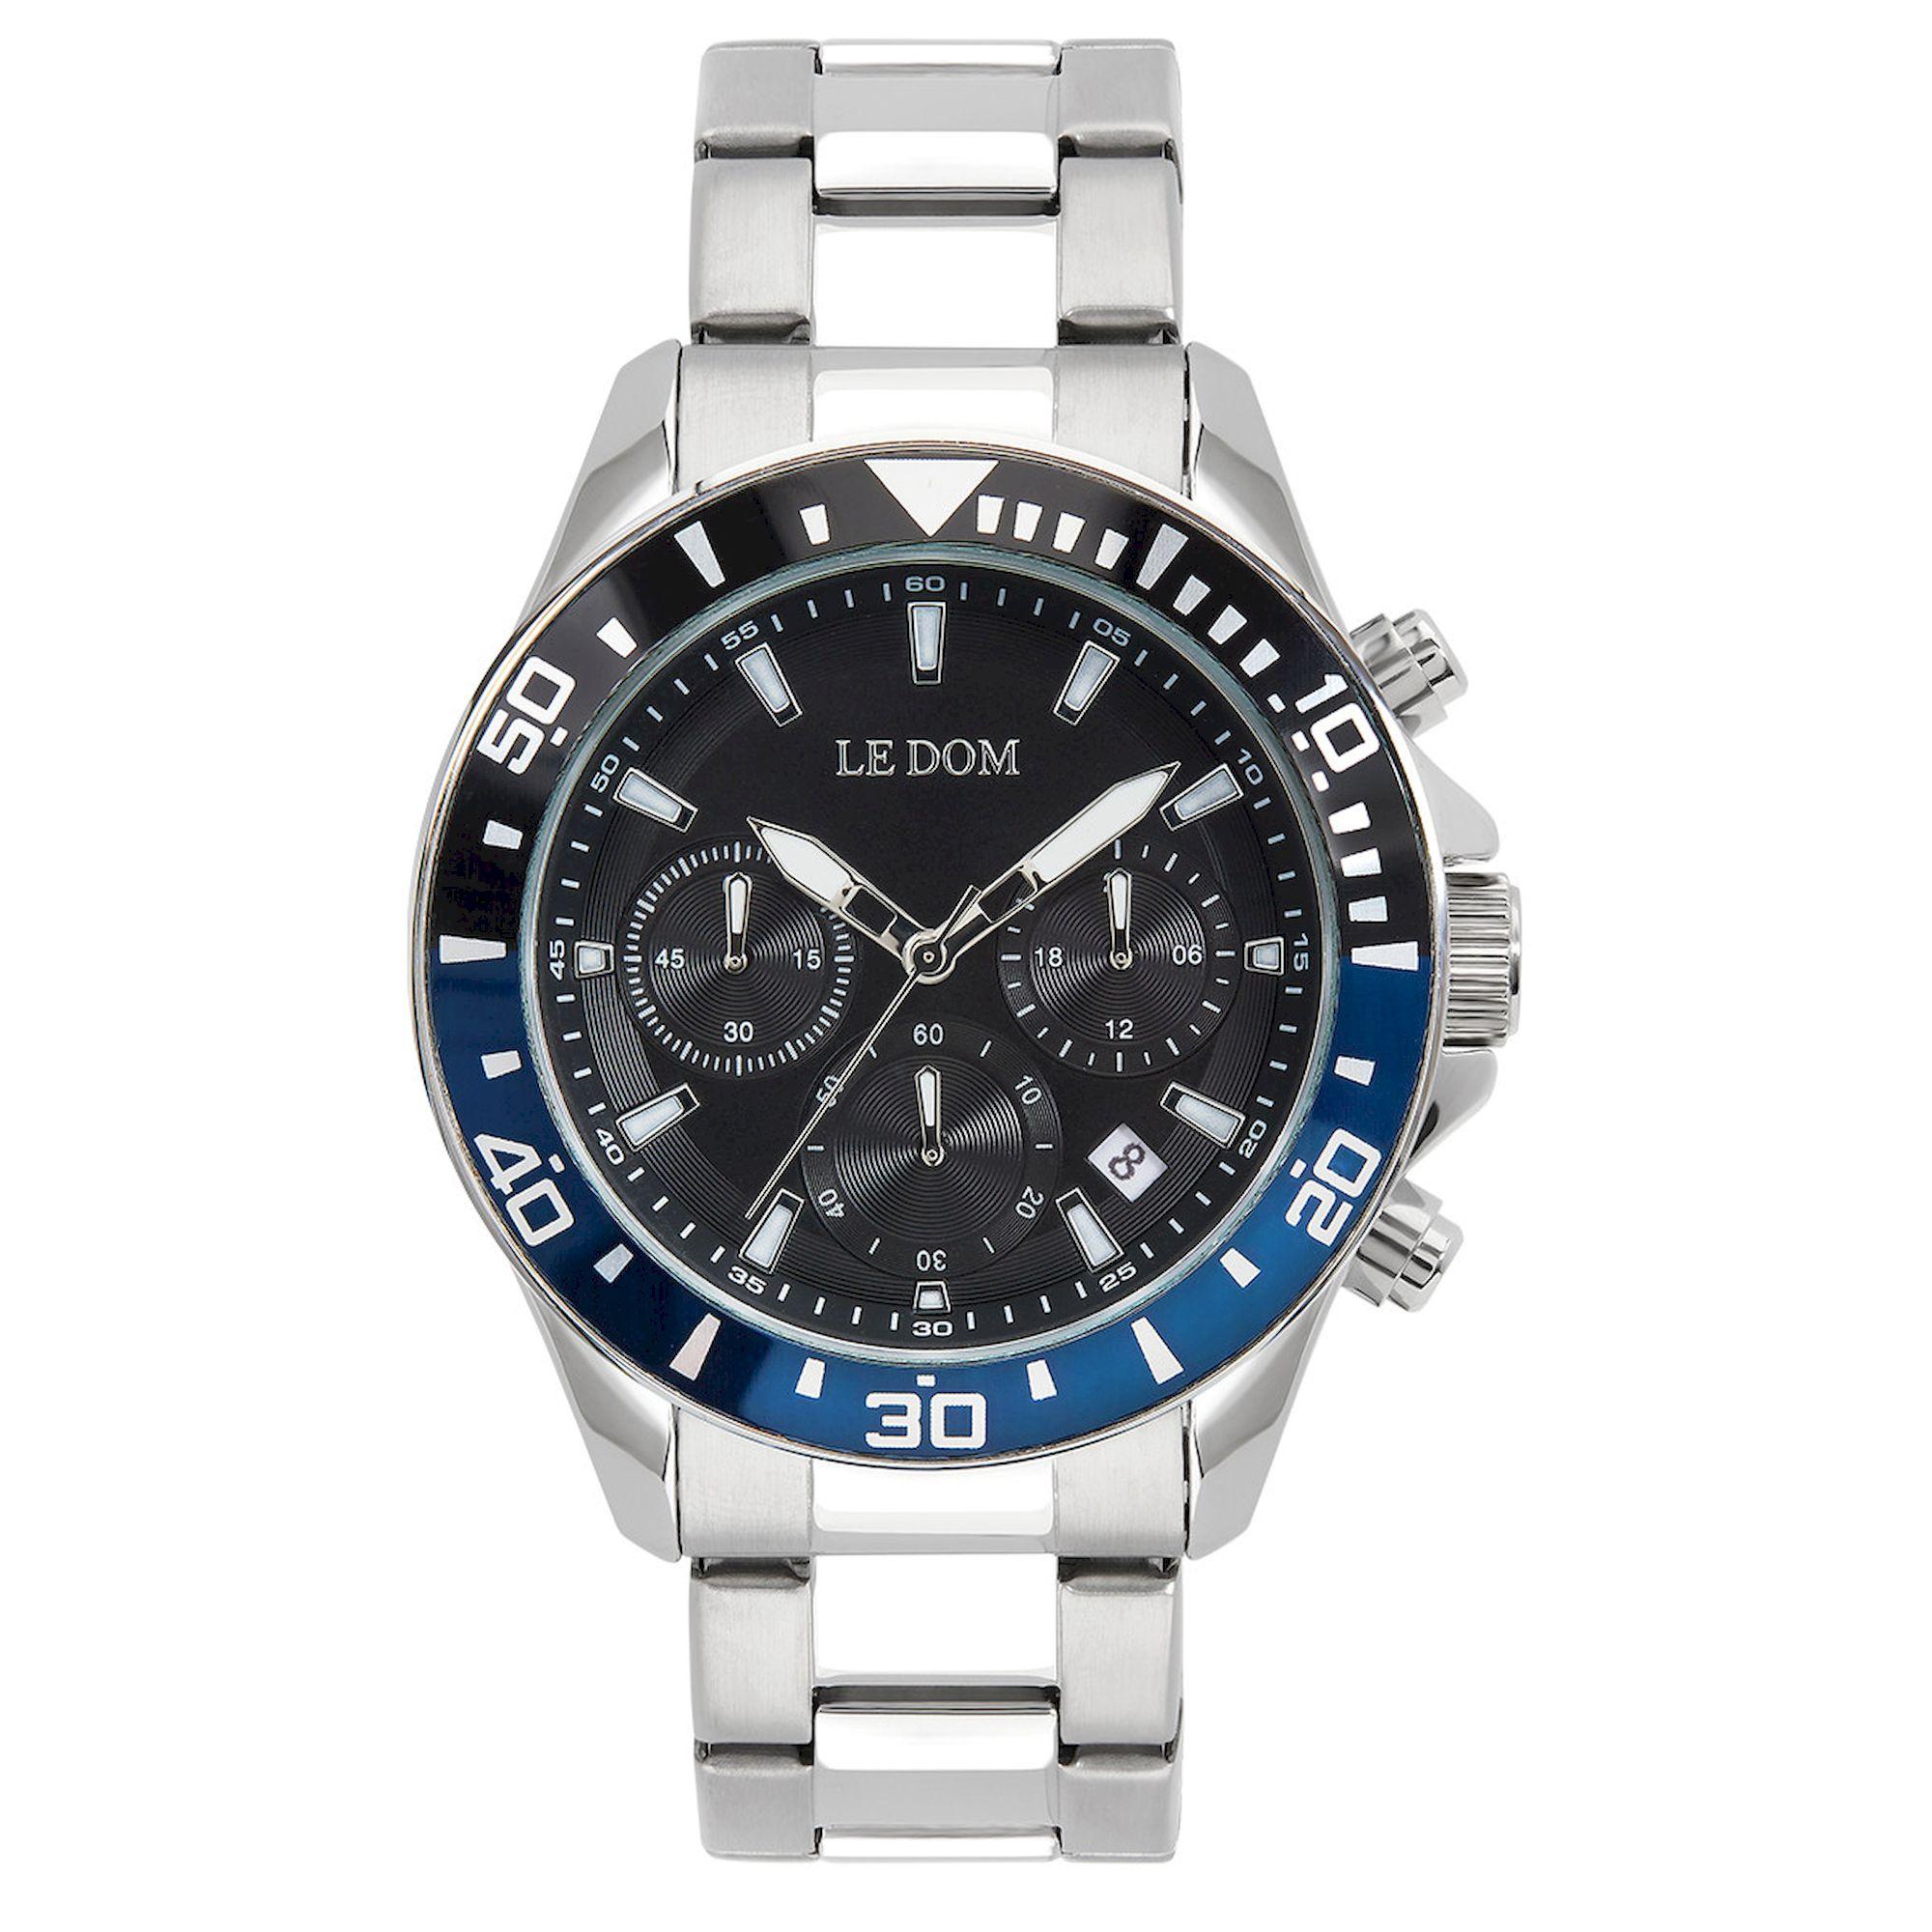 le dom, ανδρικό ρολόι, ρολόγια, Δωρεάν έξοδα αποστολής, Άμεση ΔΙαθεσιμότητα, Le Dom Ρολόγια